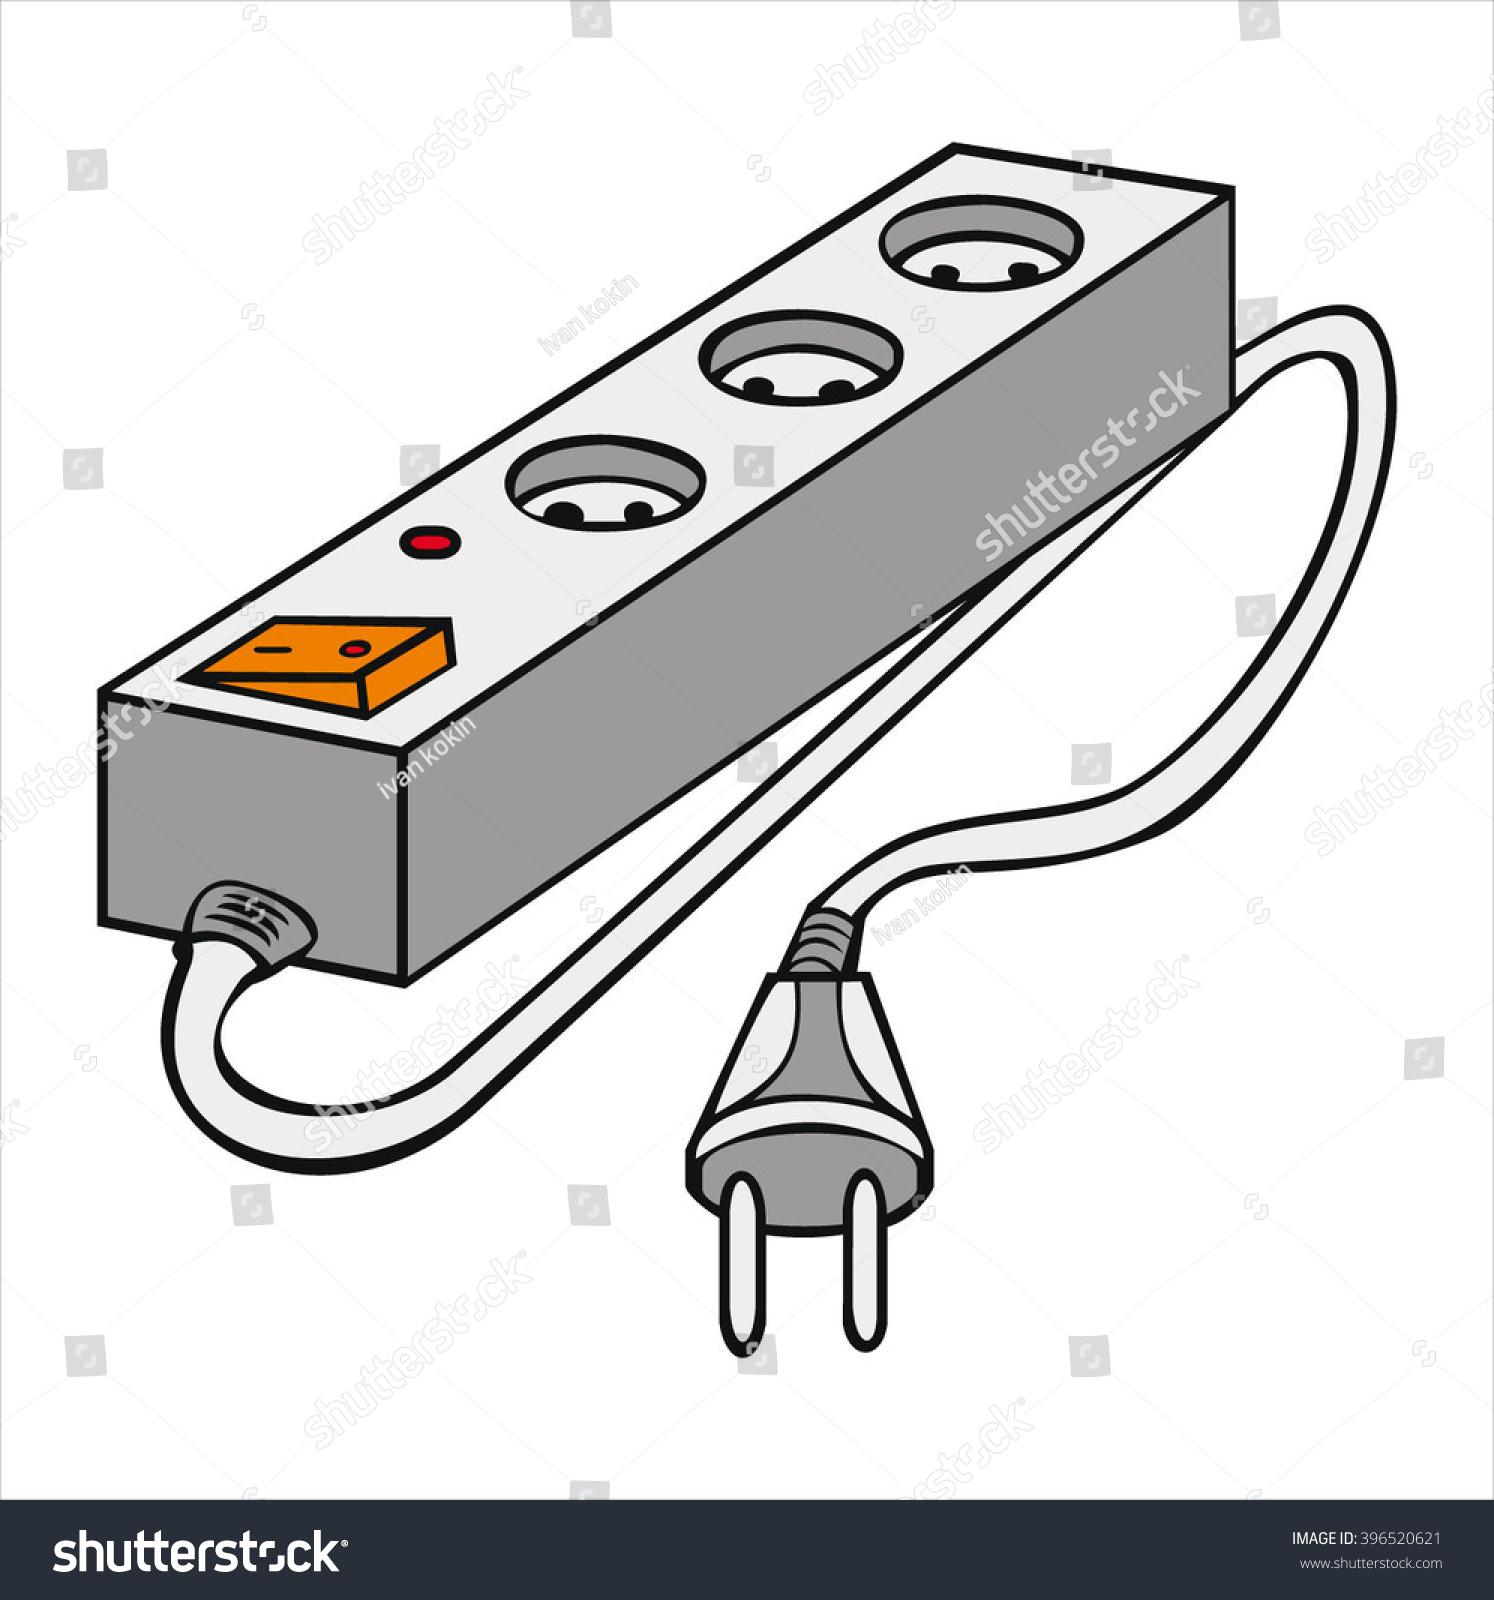 Insulated Electrical Extension Cord Cartoon Vector Stock Vector ...